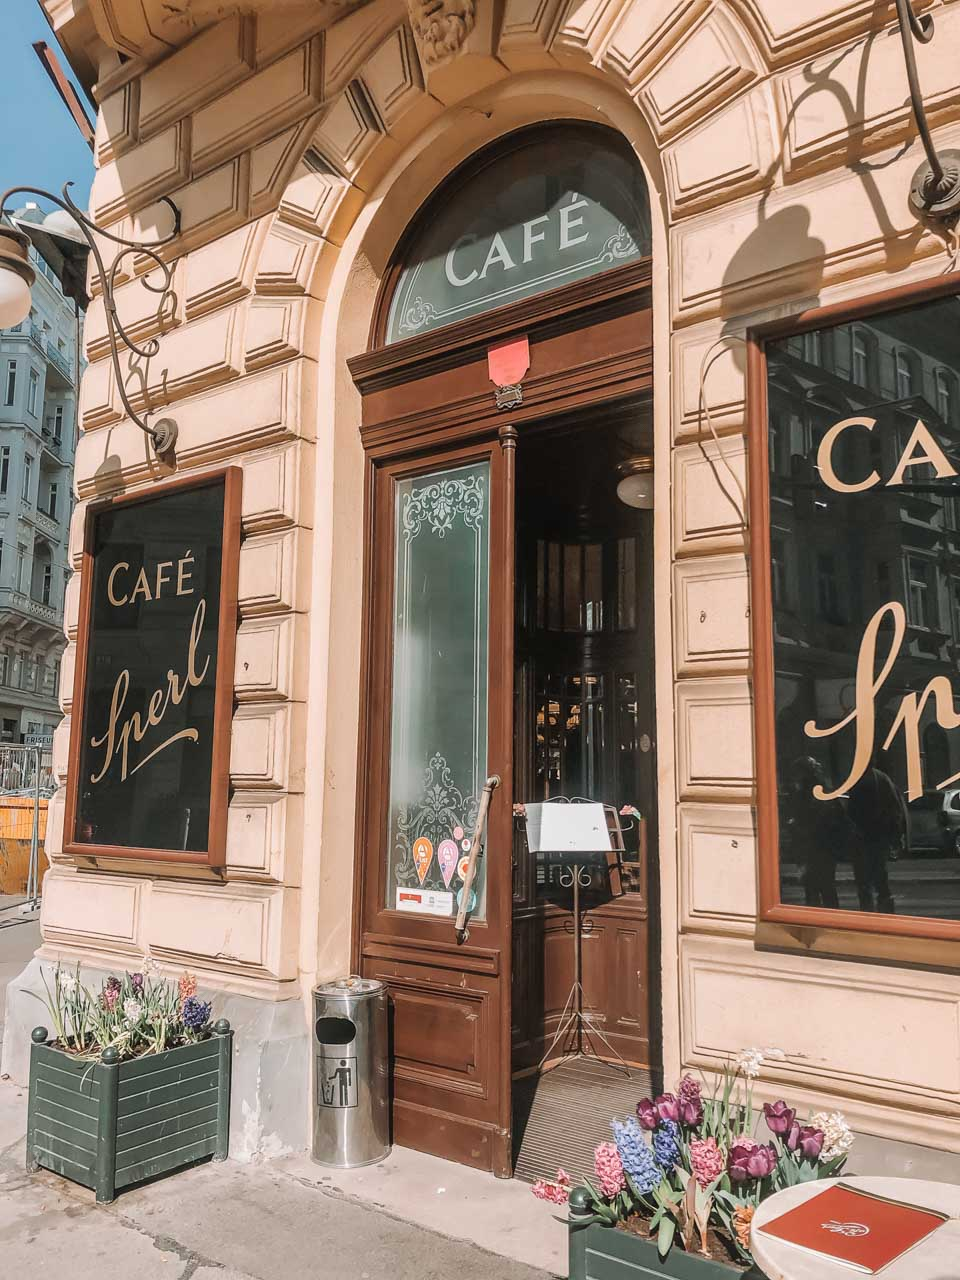 The entrance to Café Sperl in Vienna, Austria